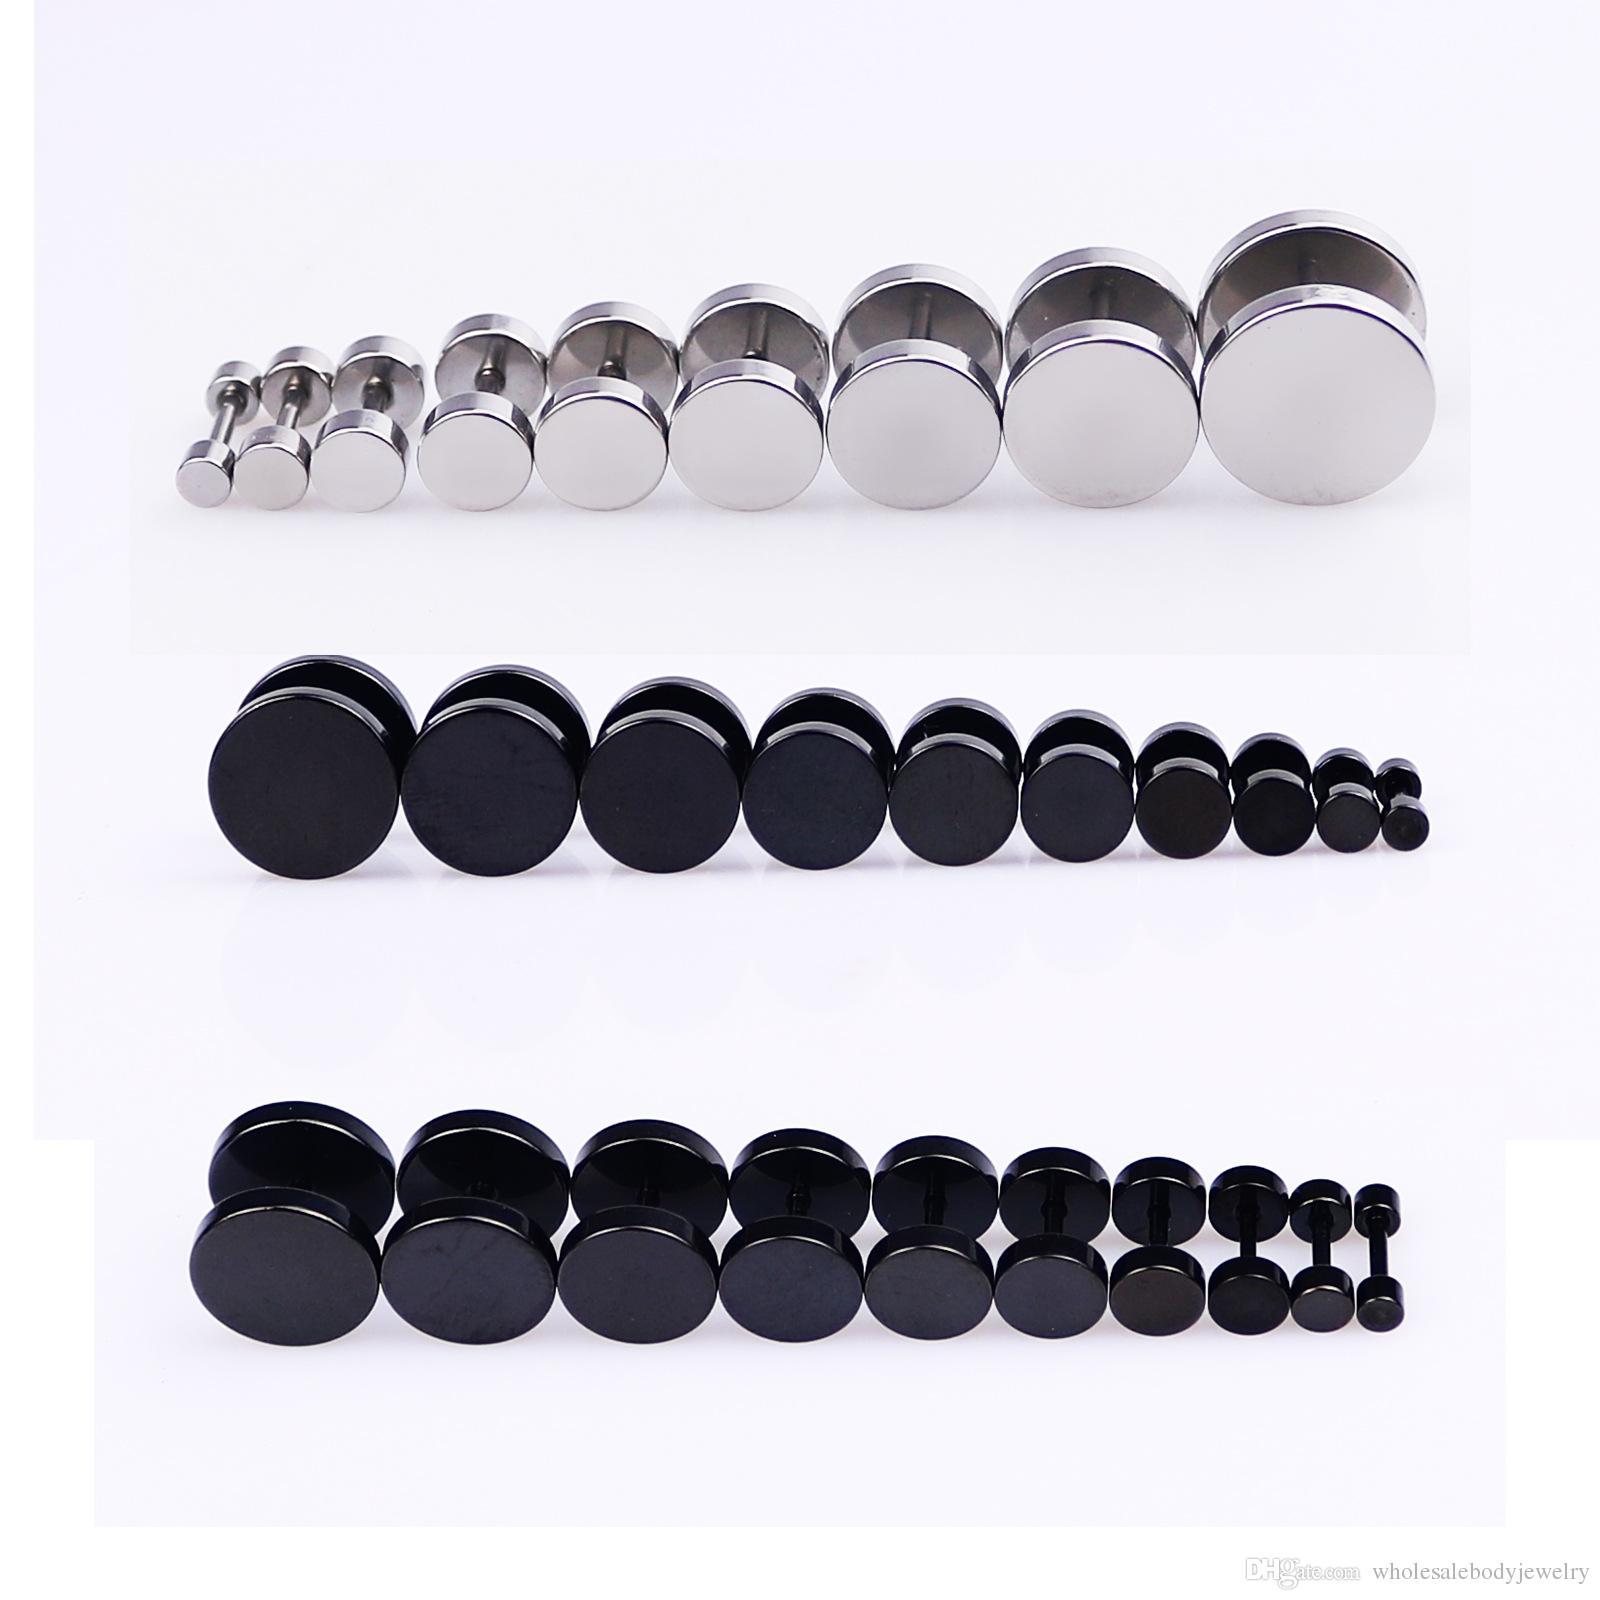 Stainless Steel Fake Cheater Ear Plugs Gauge Body Jewelry Pierceing 6-14mm Hot Sale